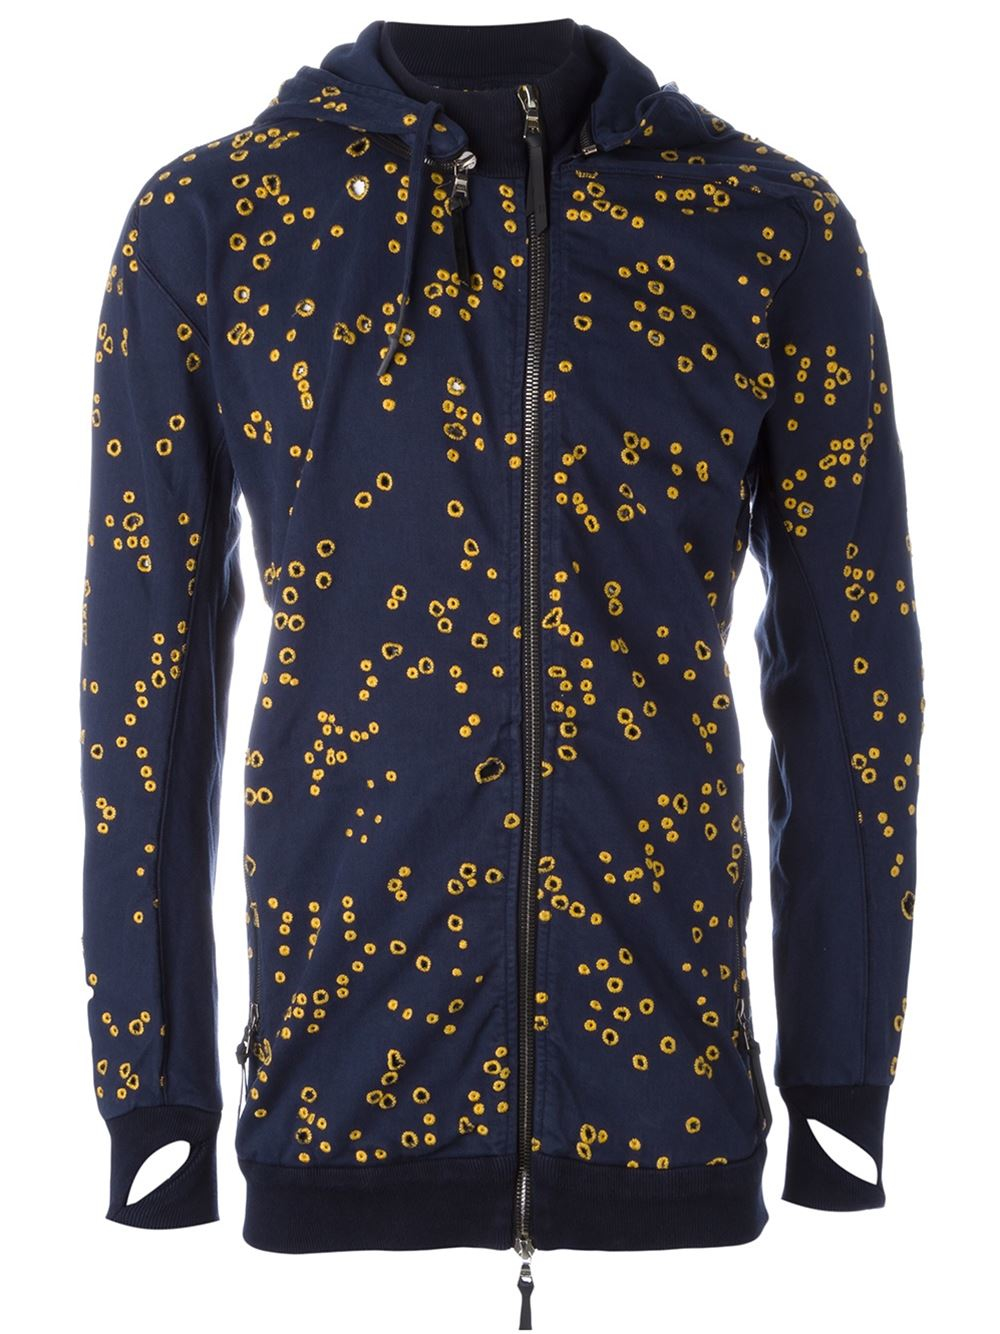 Lyst Boris Bidjan Saberi 11 Perforated Hooded Jacket In